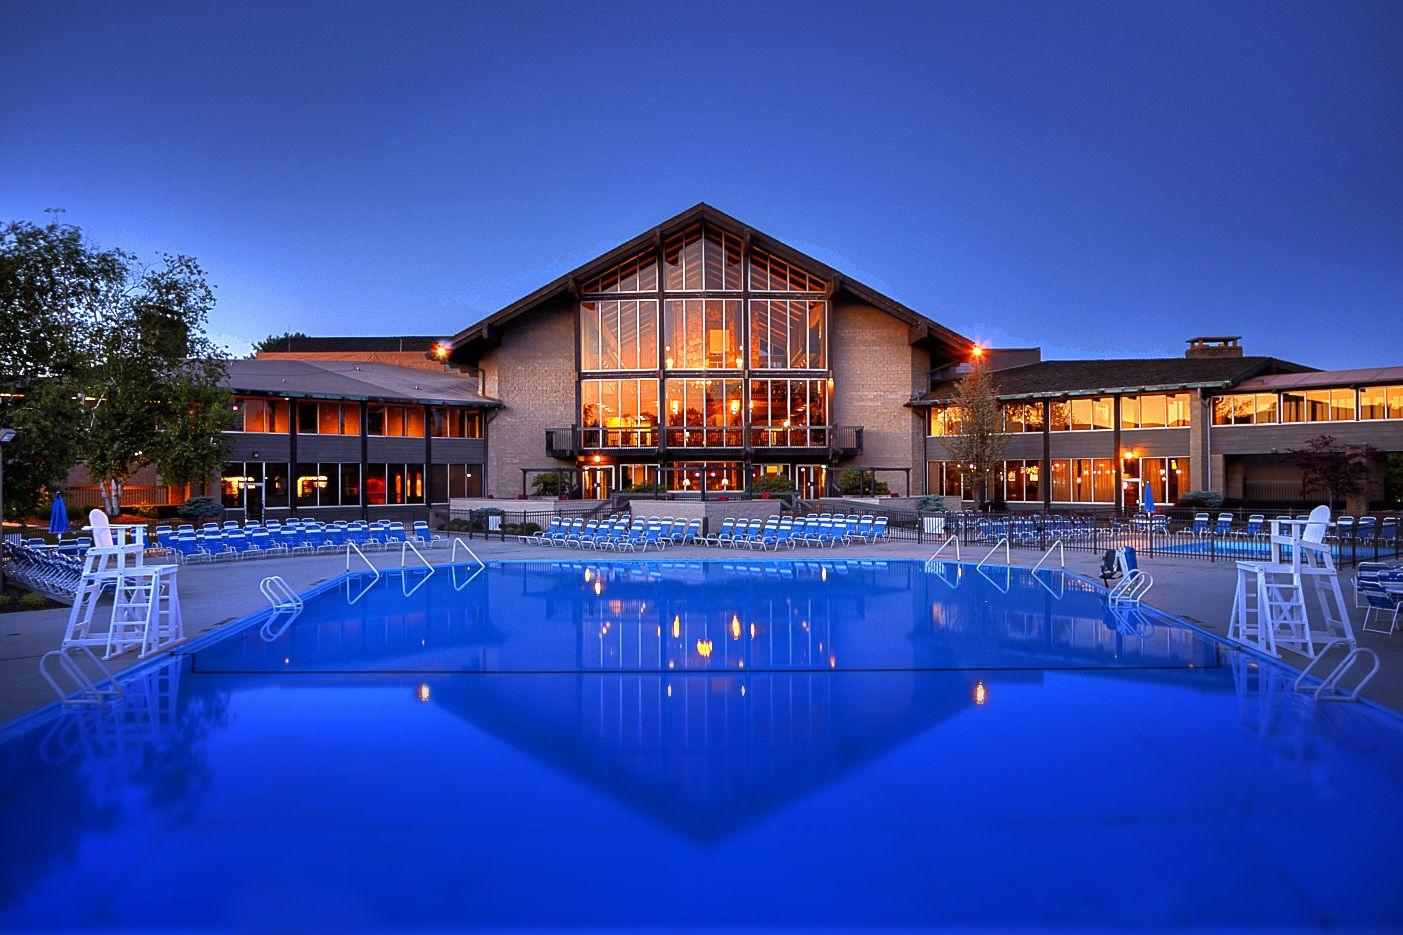 Kalahari Resorts & Conventions   Ohios Lake Erie Shores